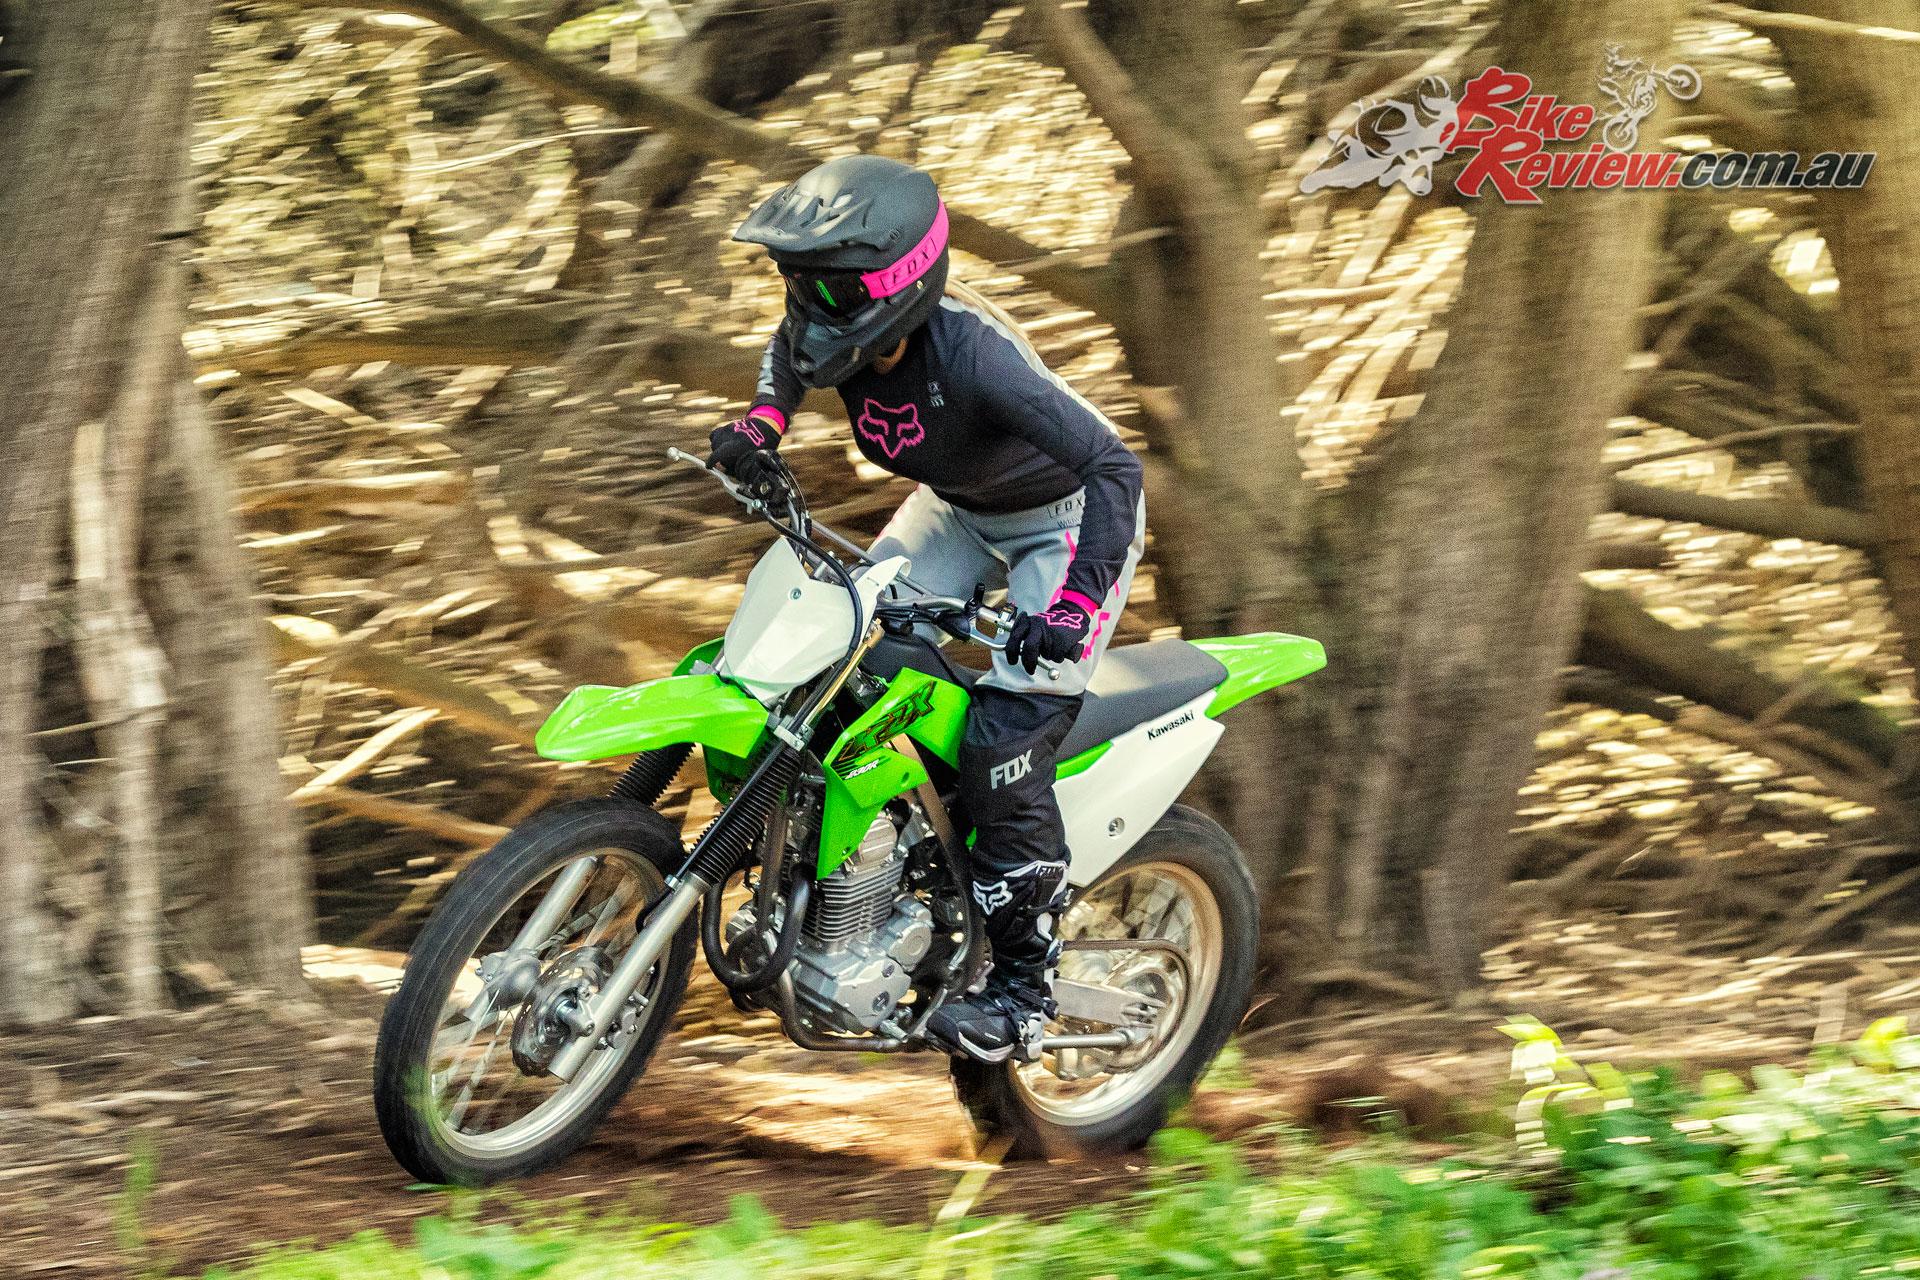 New Model 2020 Kawasaki Klx230r Bike Review